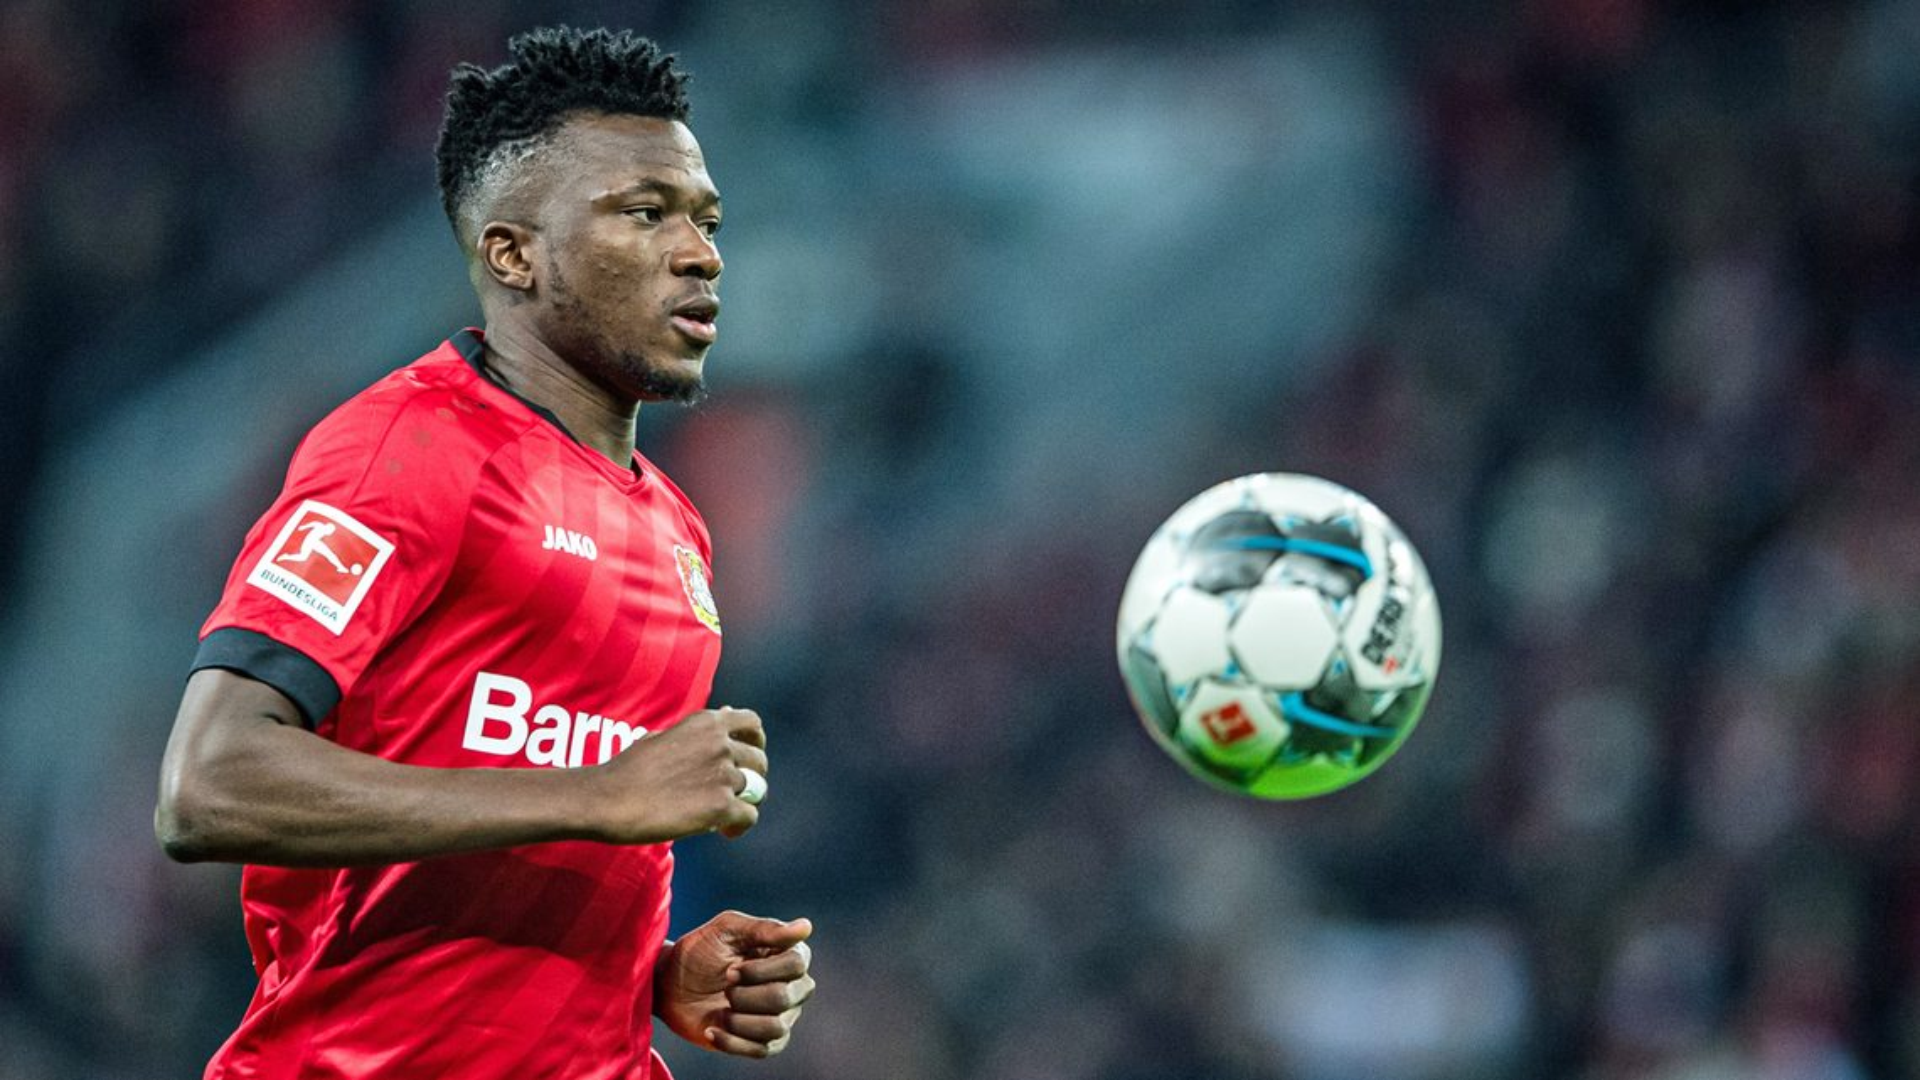 Bundesliga | Edmond Tapsoba on life at Bayer Leverkusen and ...